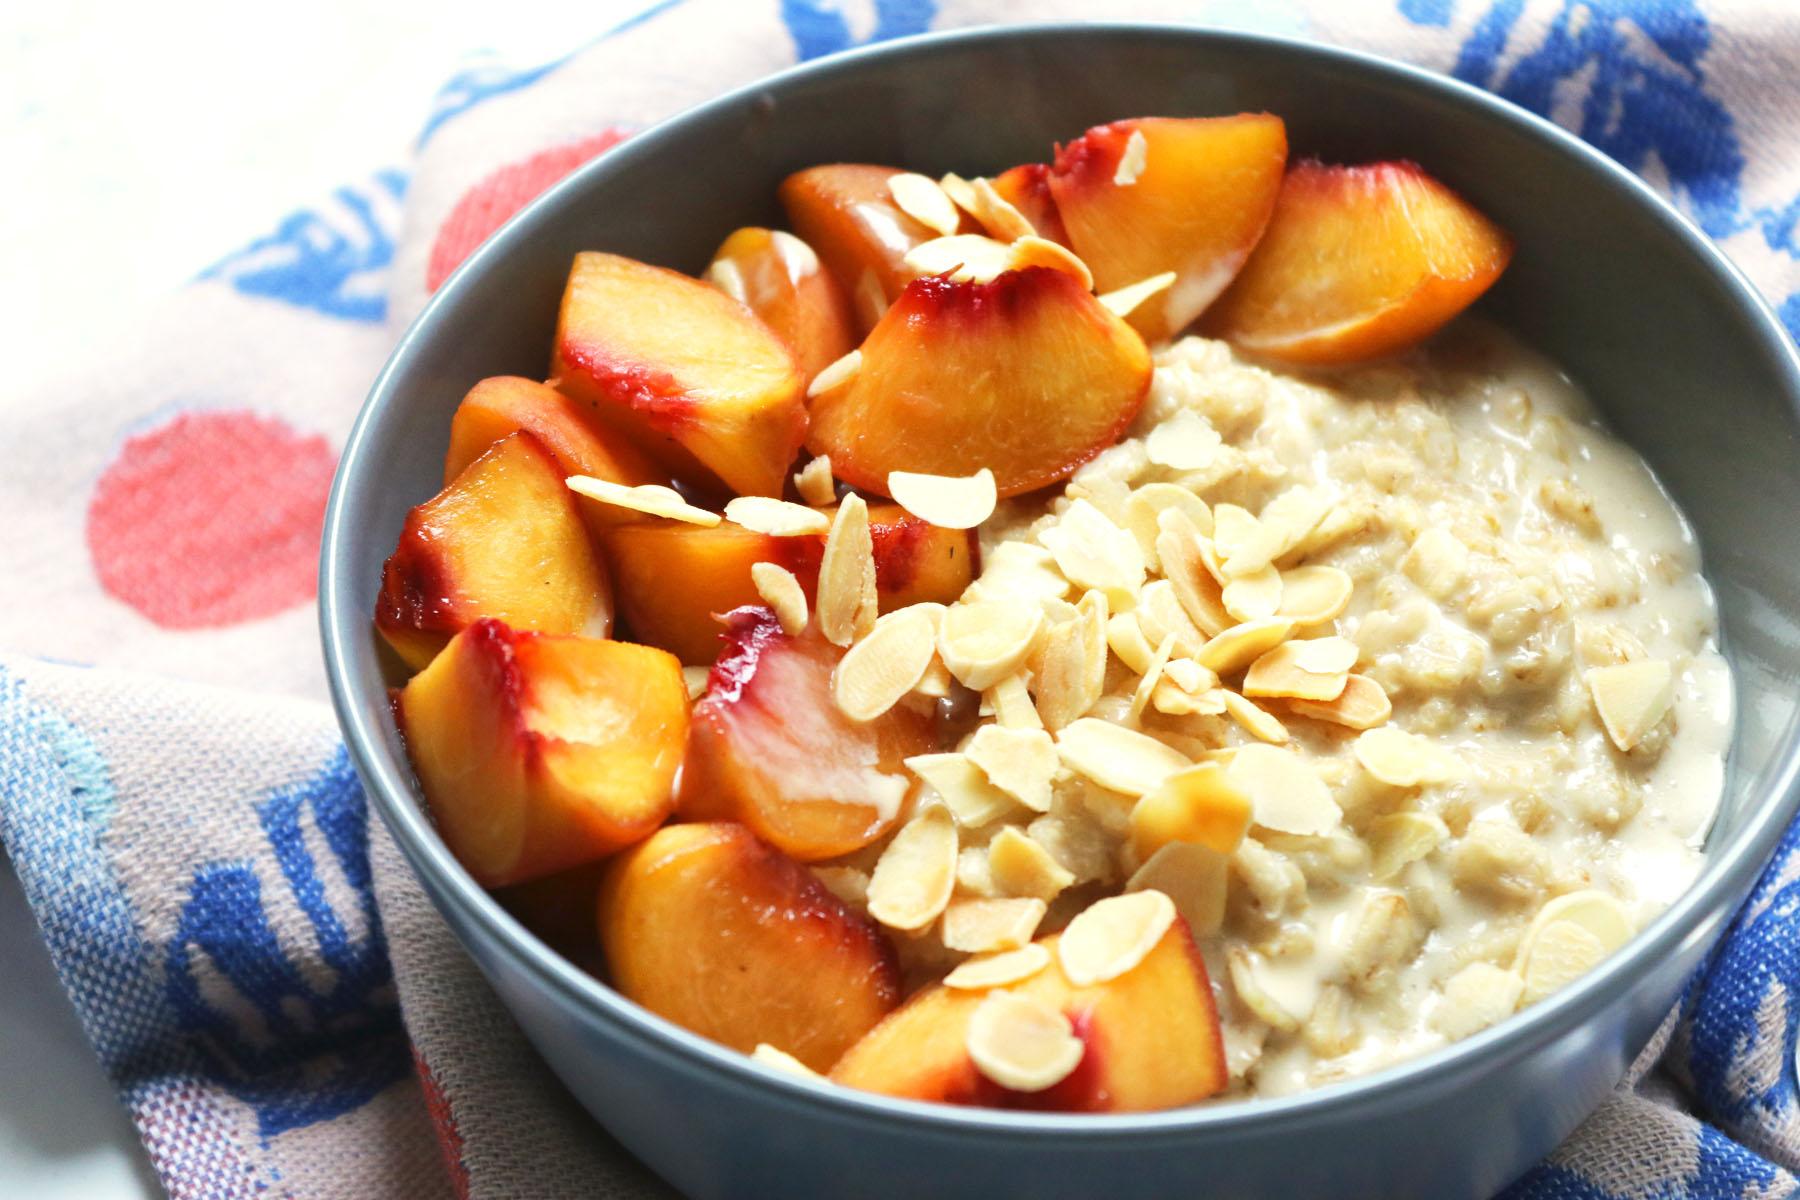 Peach and Cardamom Porridge